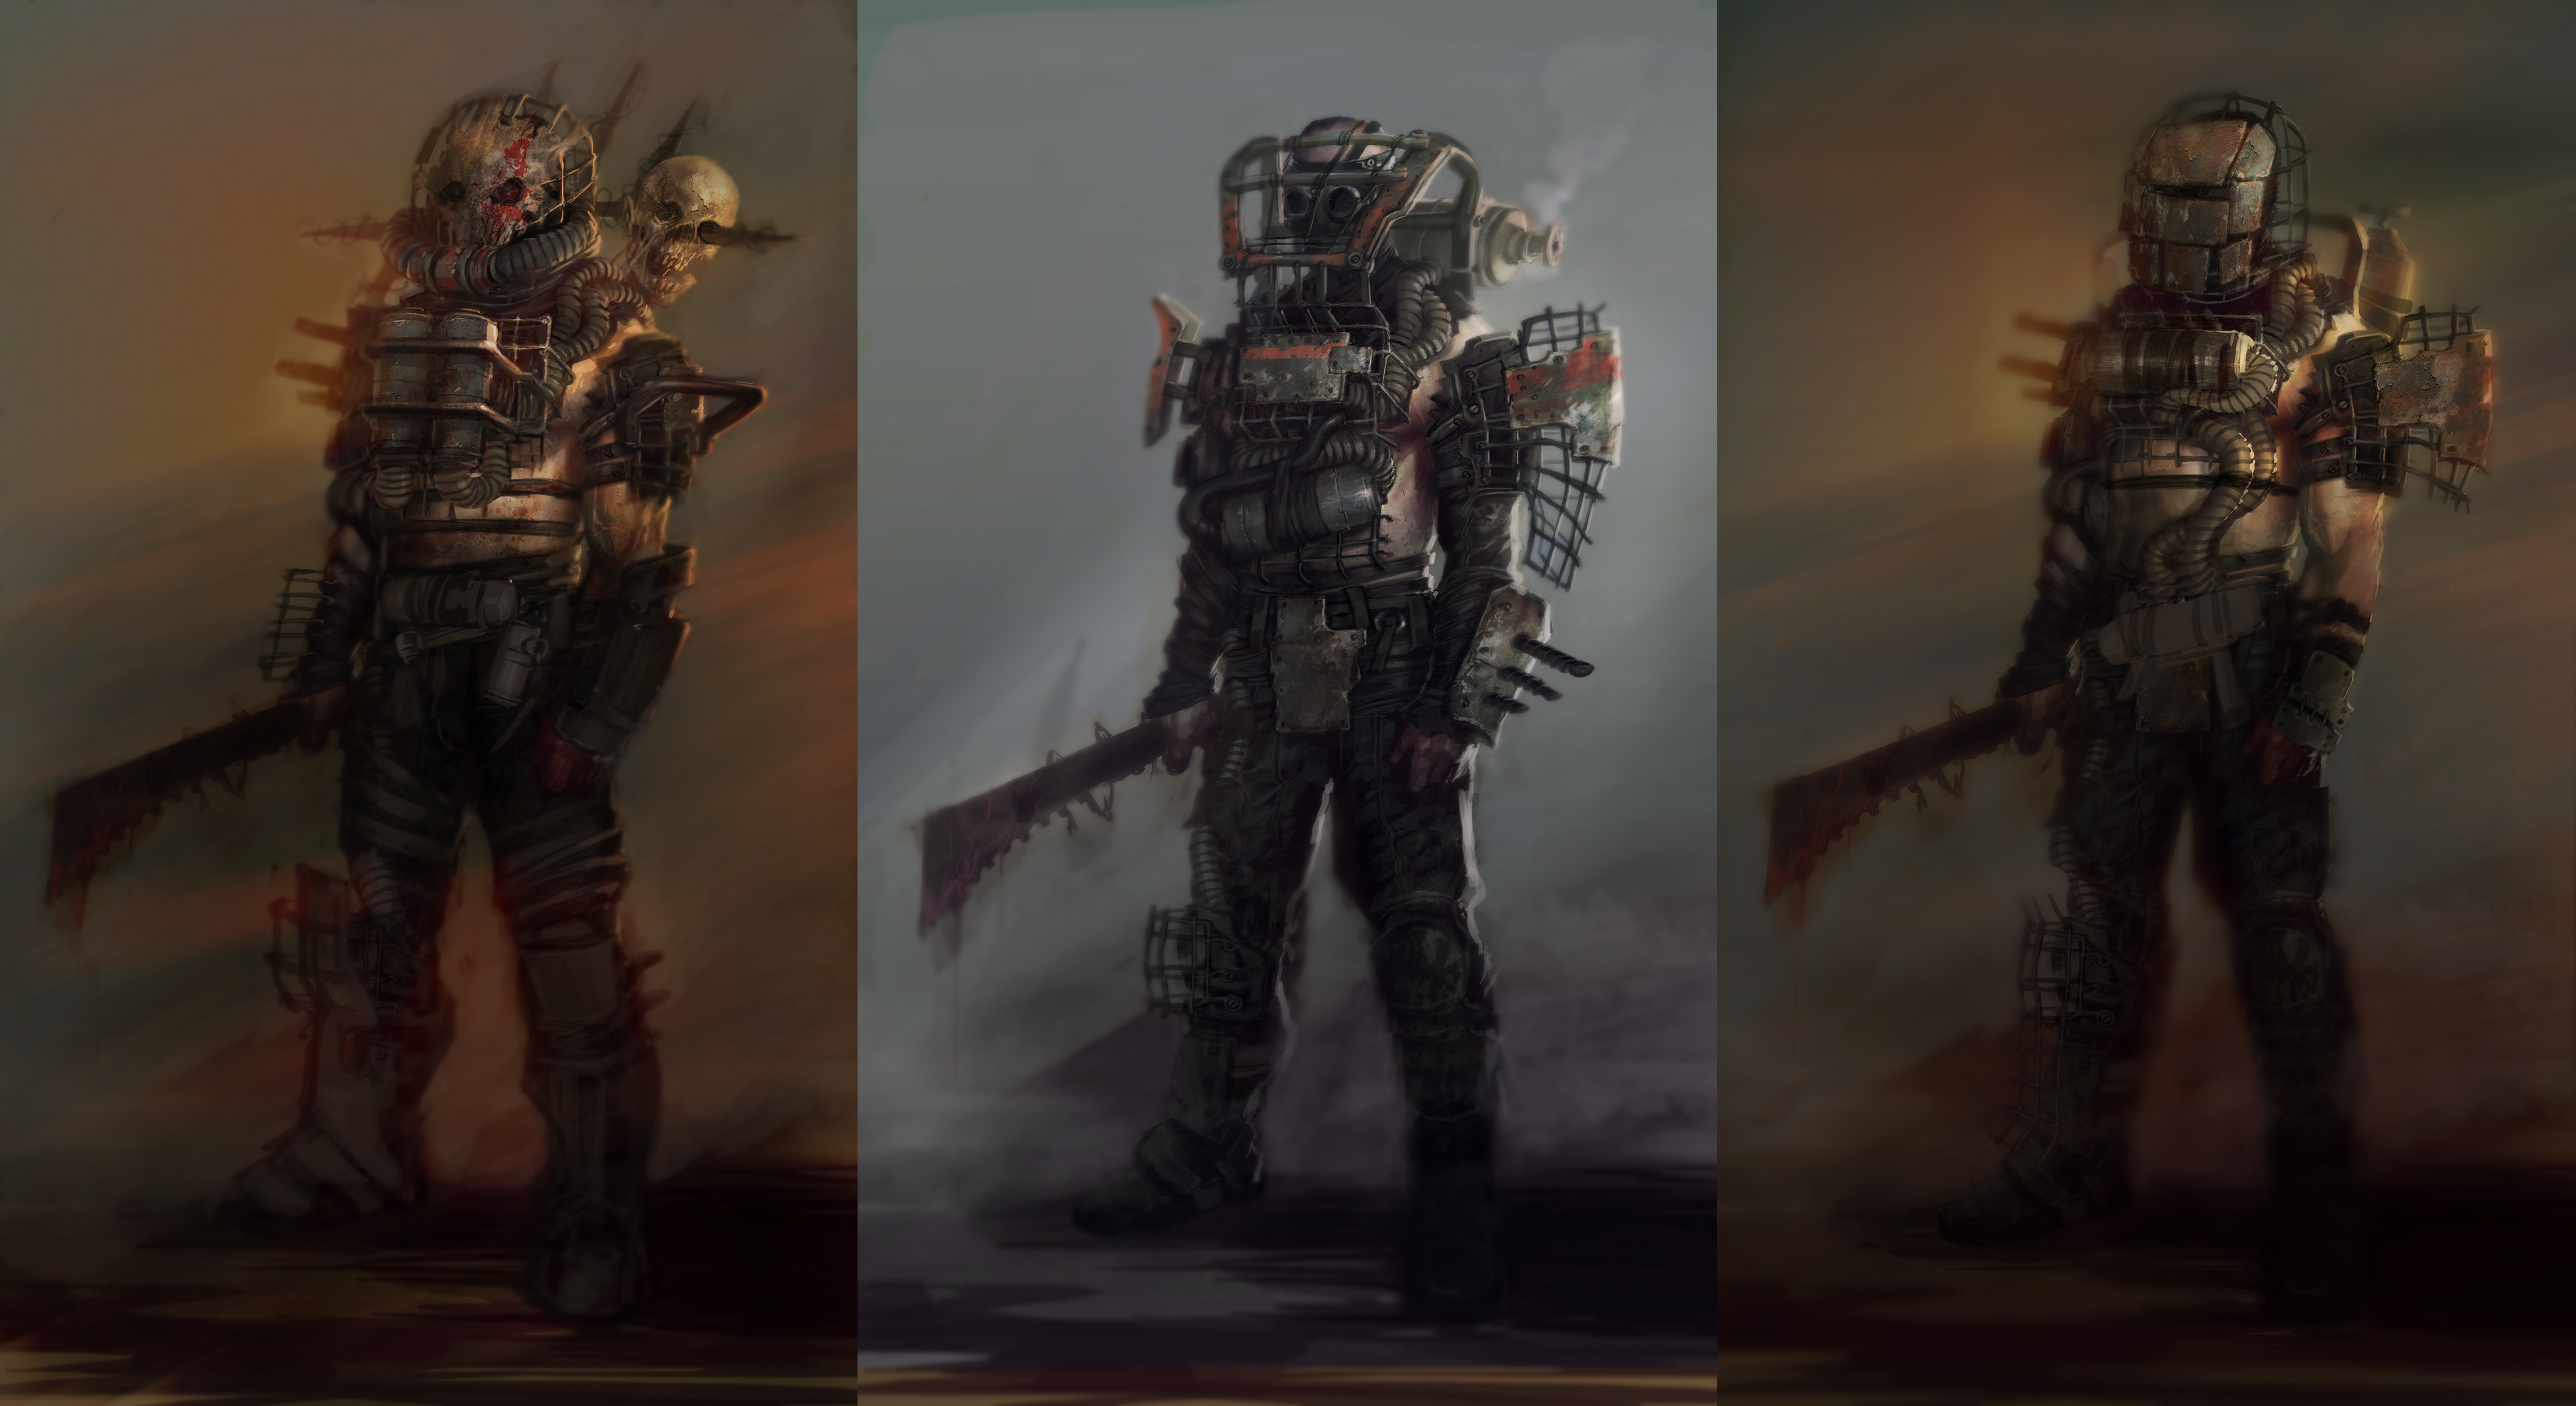 Fallout 76 Concept Art 53549 Hd Wallpaper Backgrounds Download